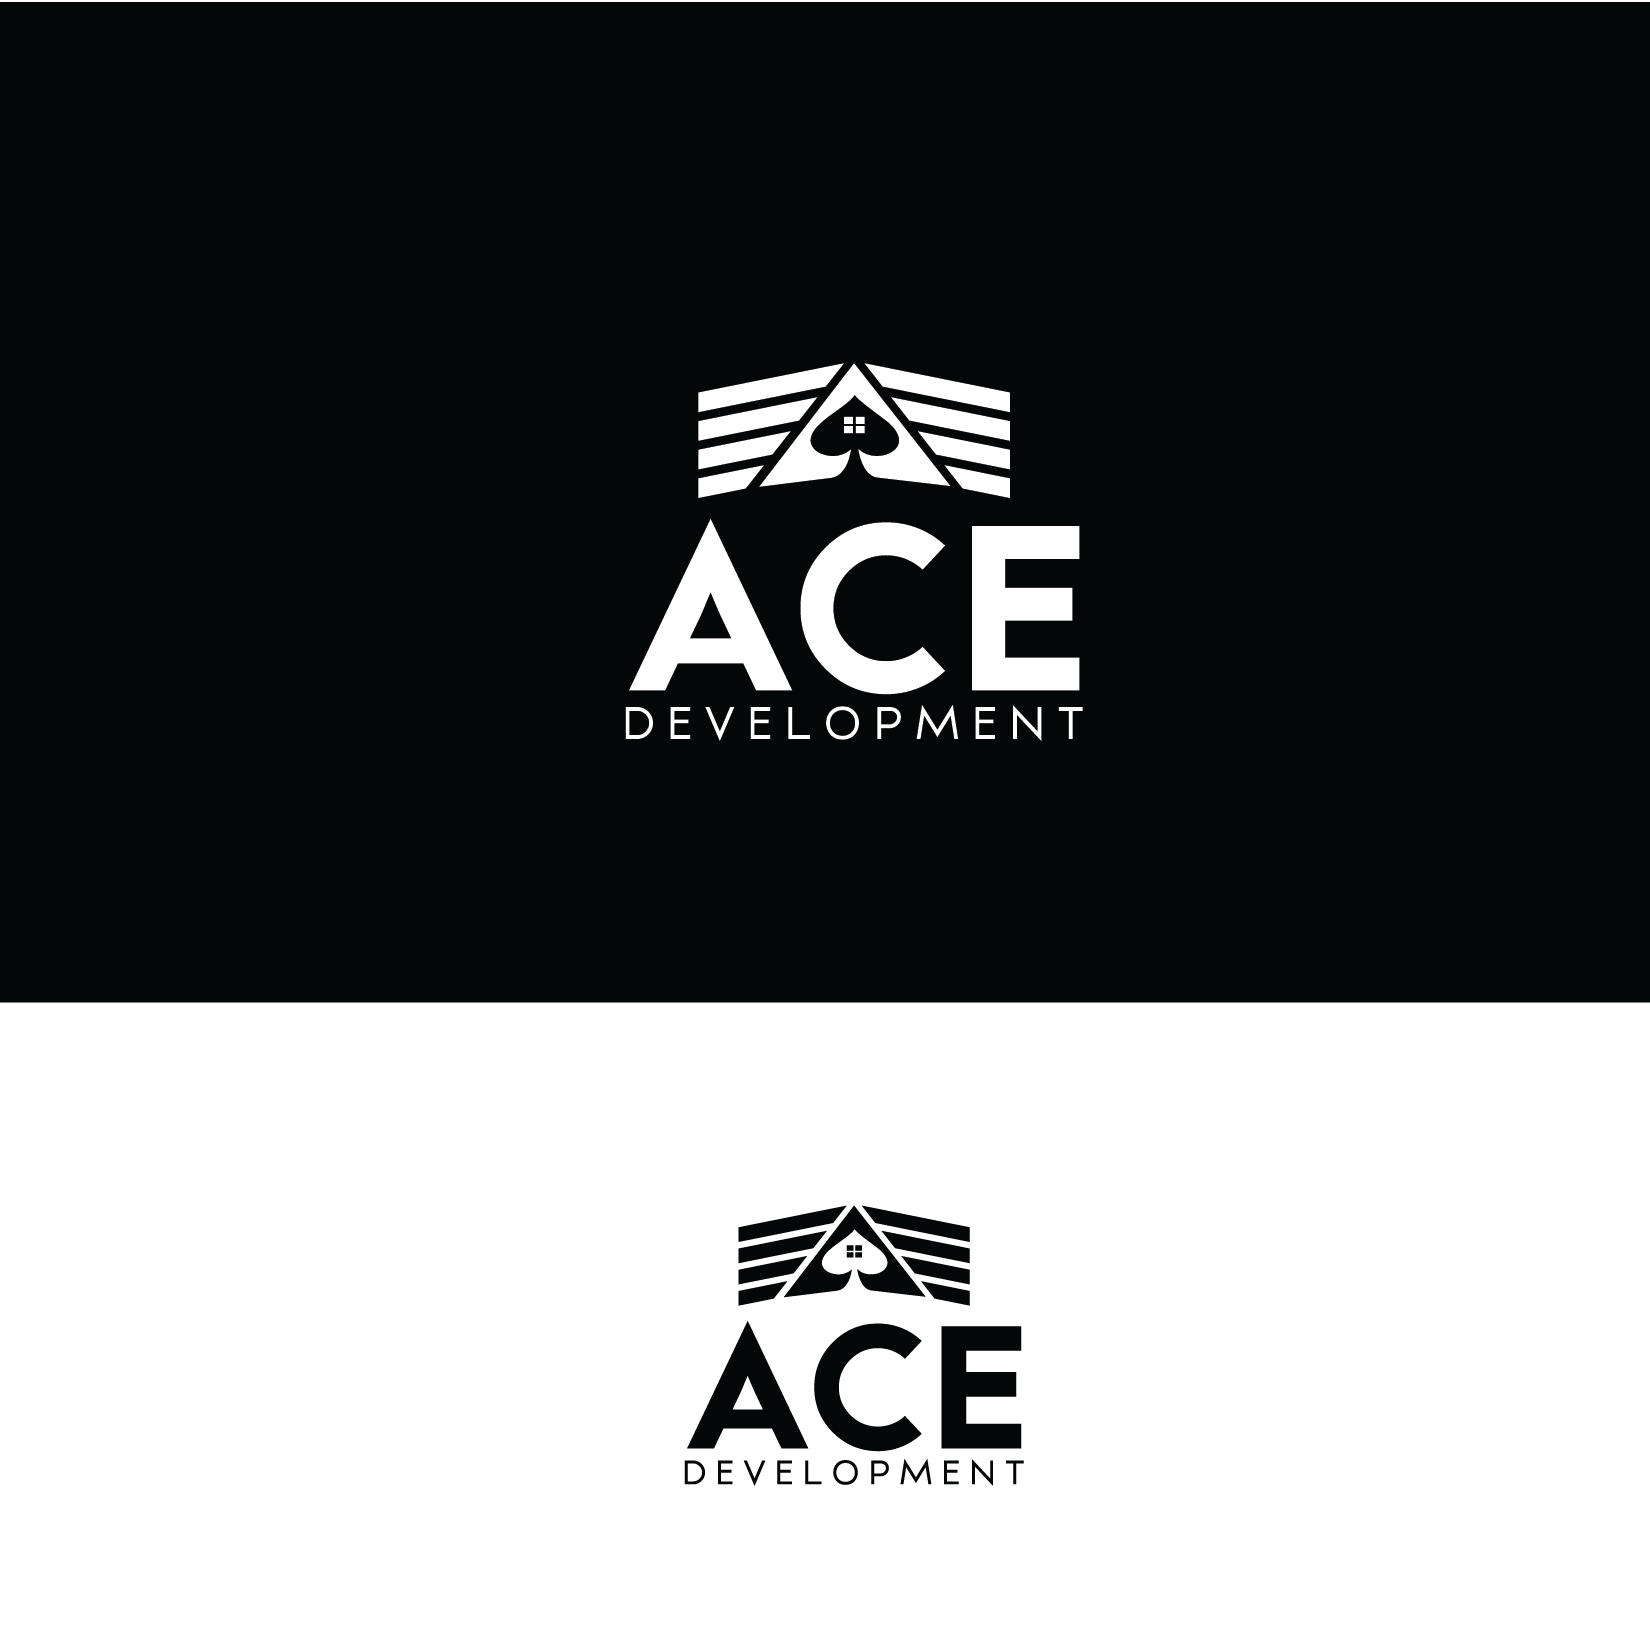 Logo Design by Private User - Entry No. 111 in the Logo Design Contest Fun Logo Design for Ace development.